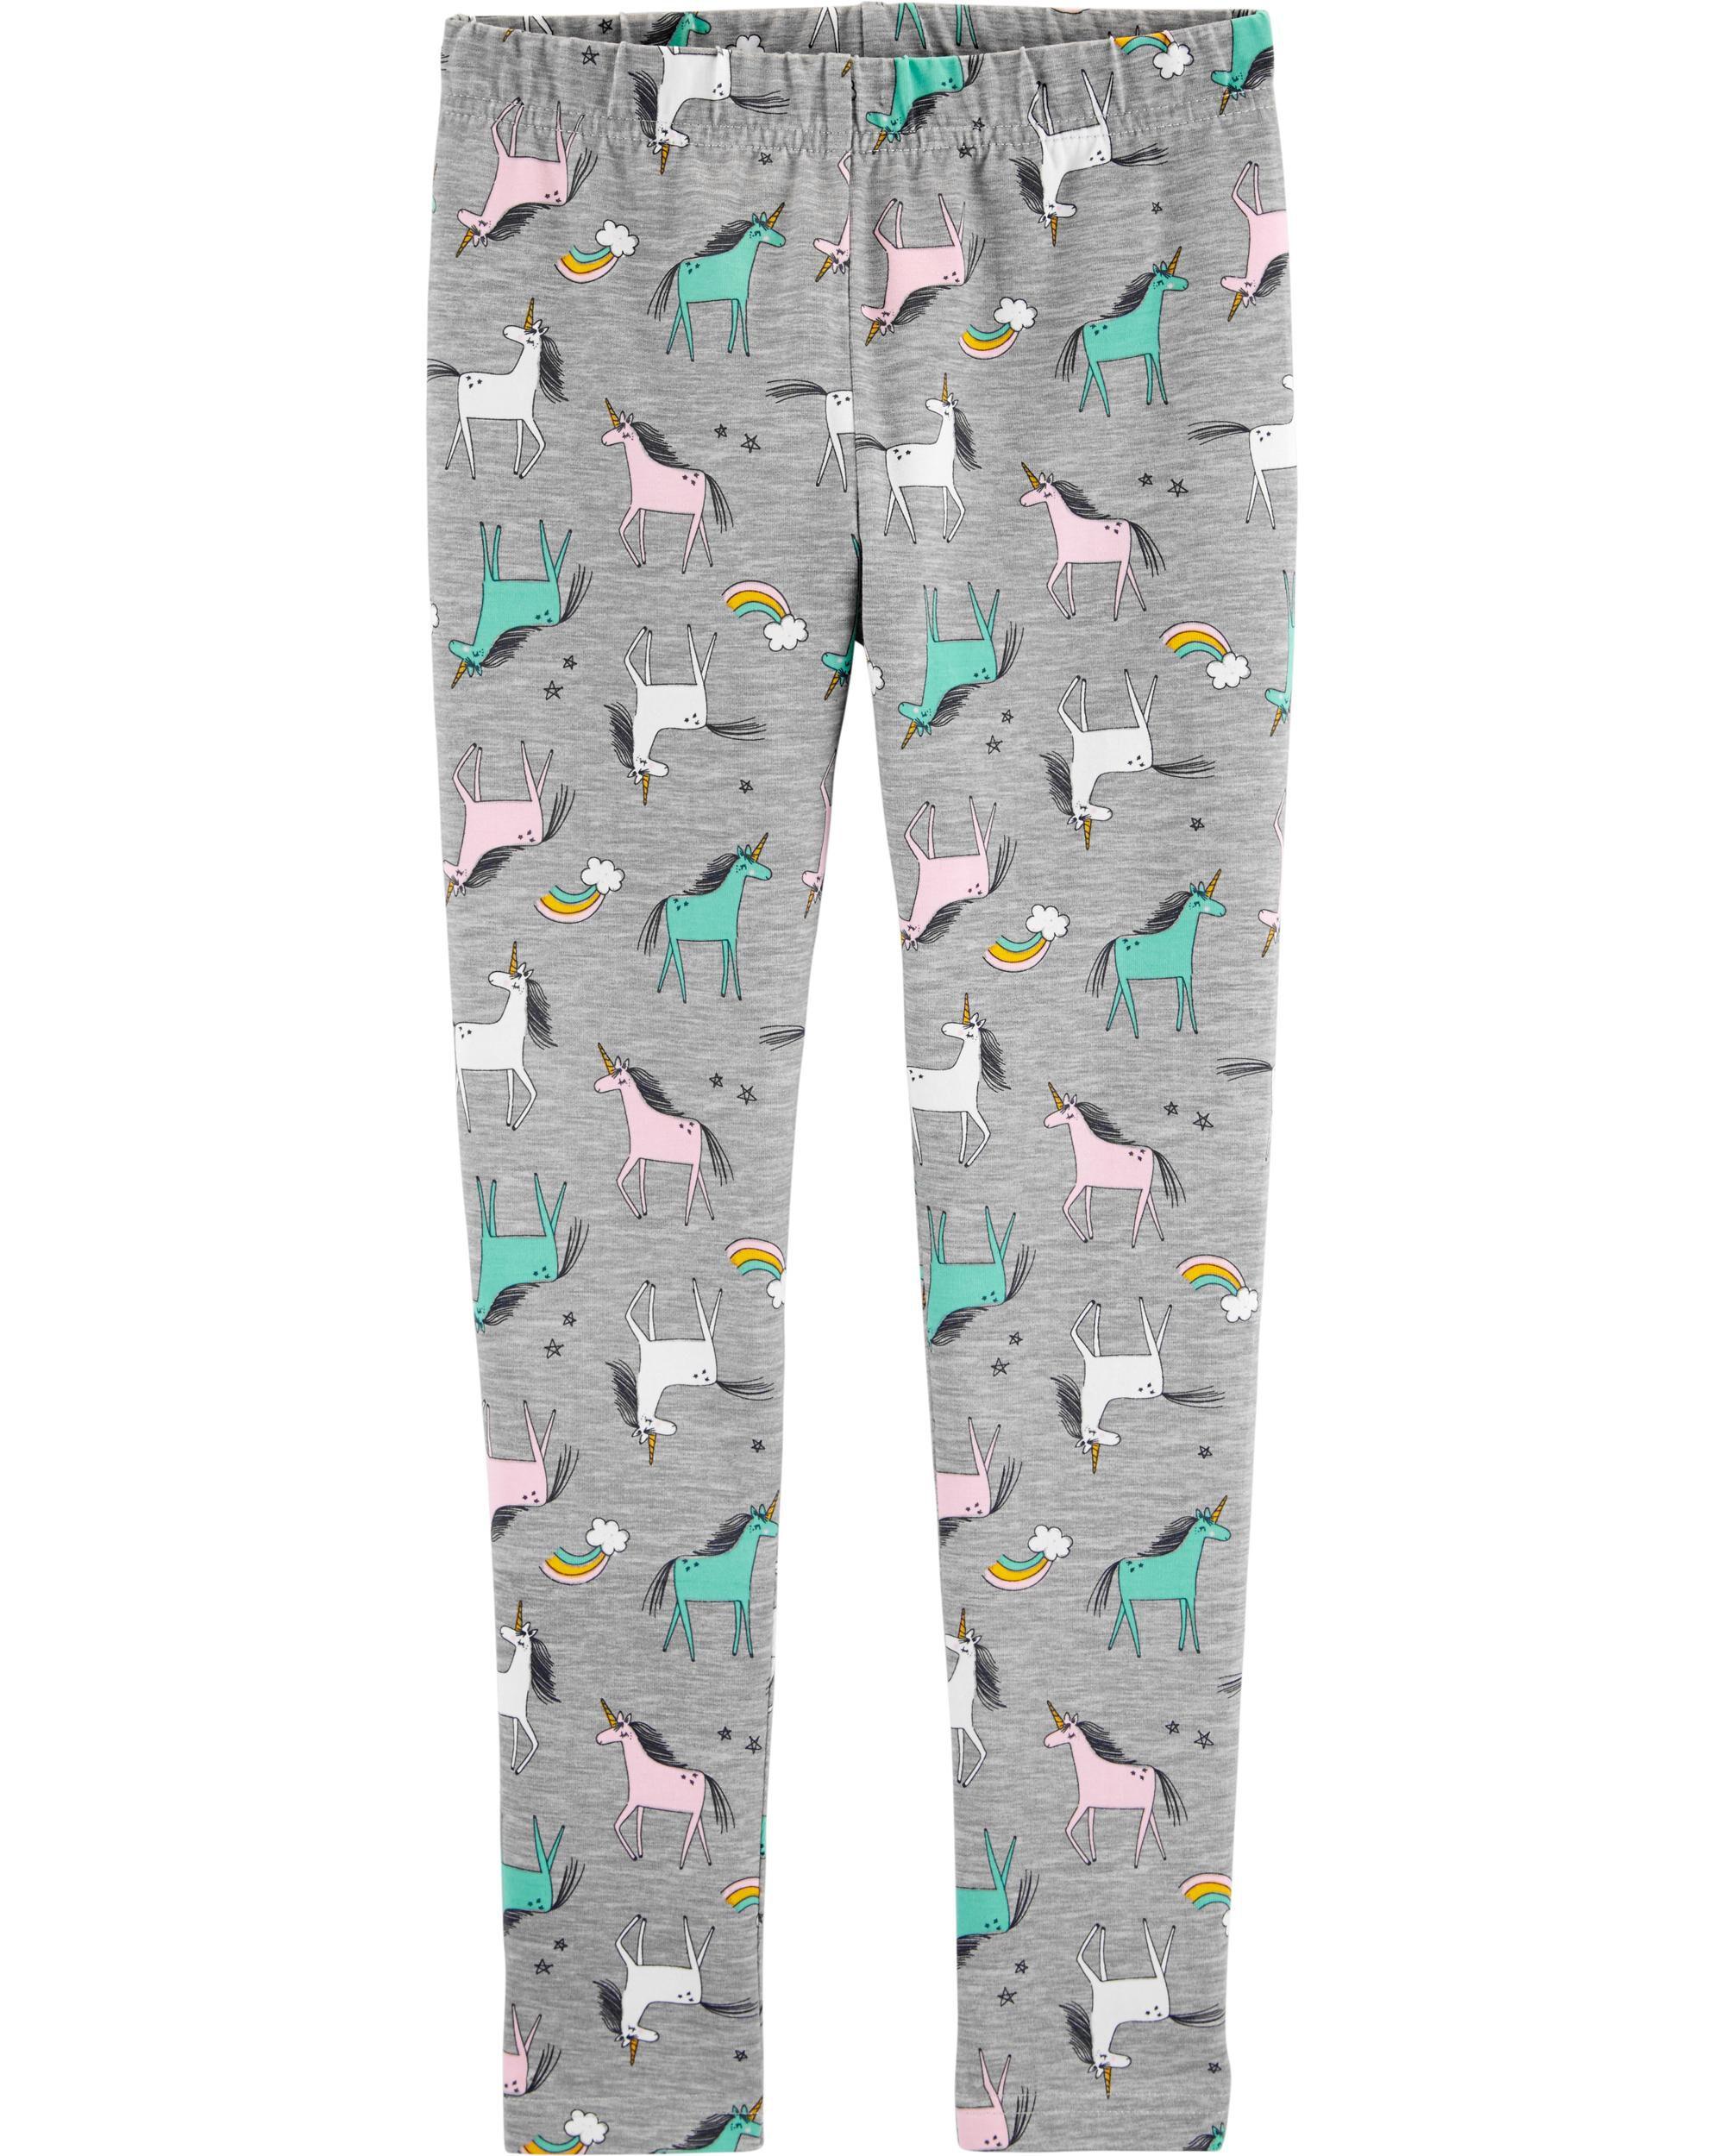 *DOORBUSTER* Unicorn Leggings